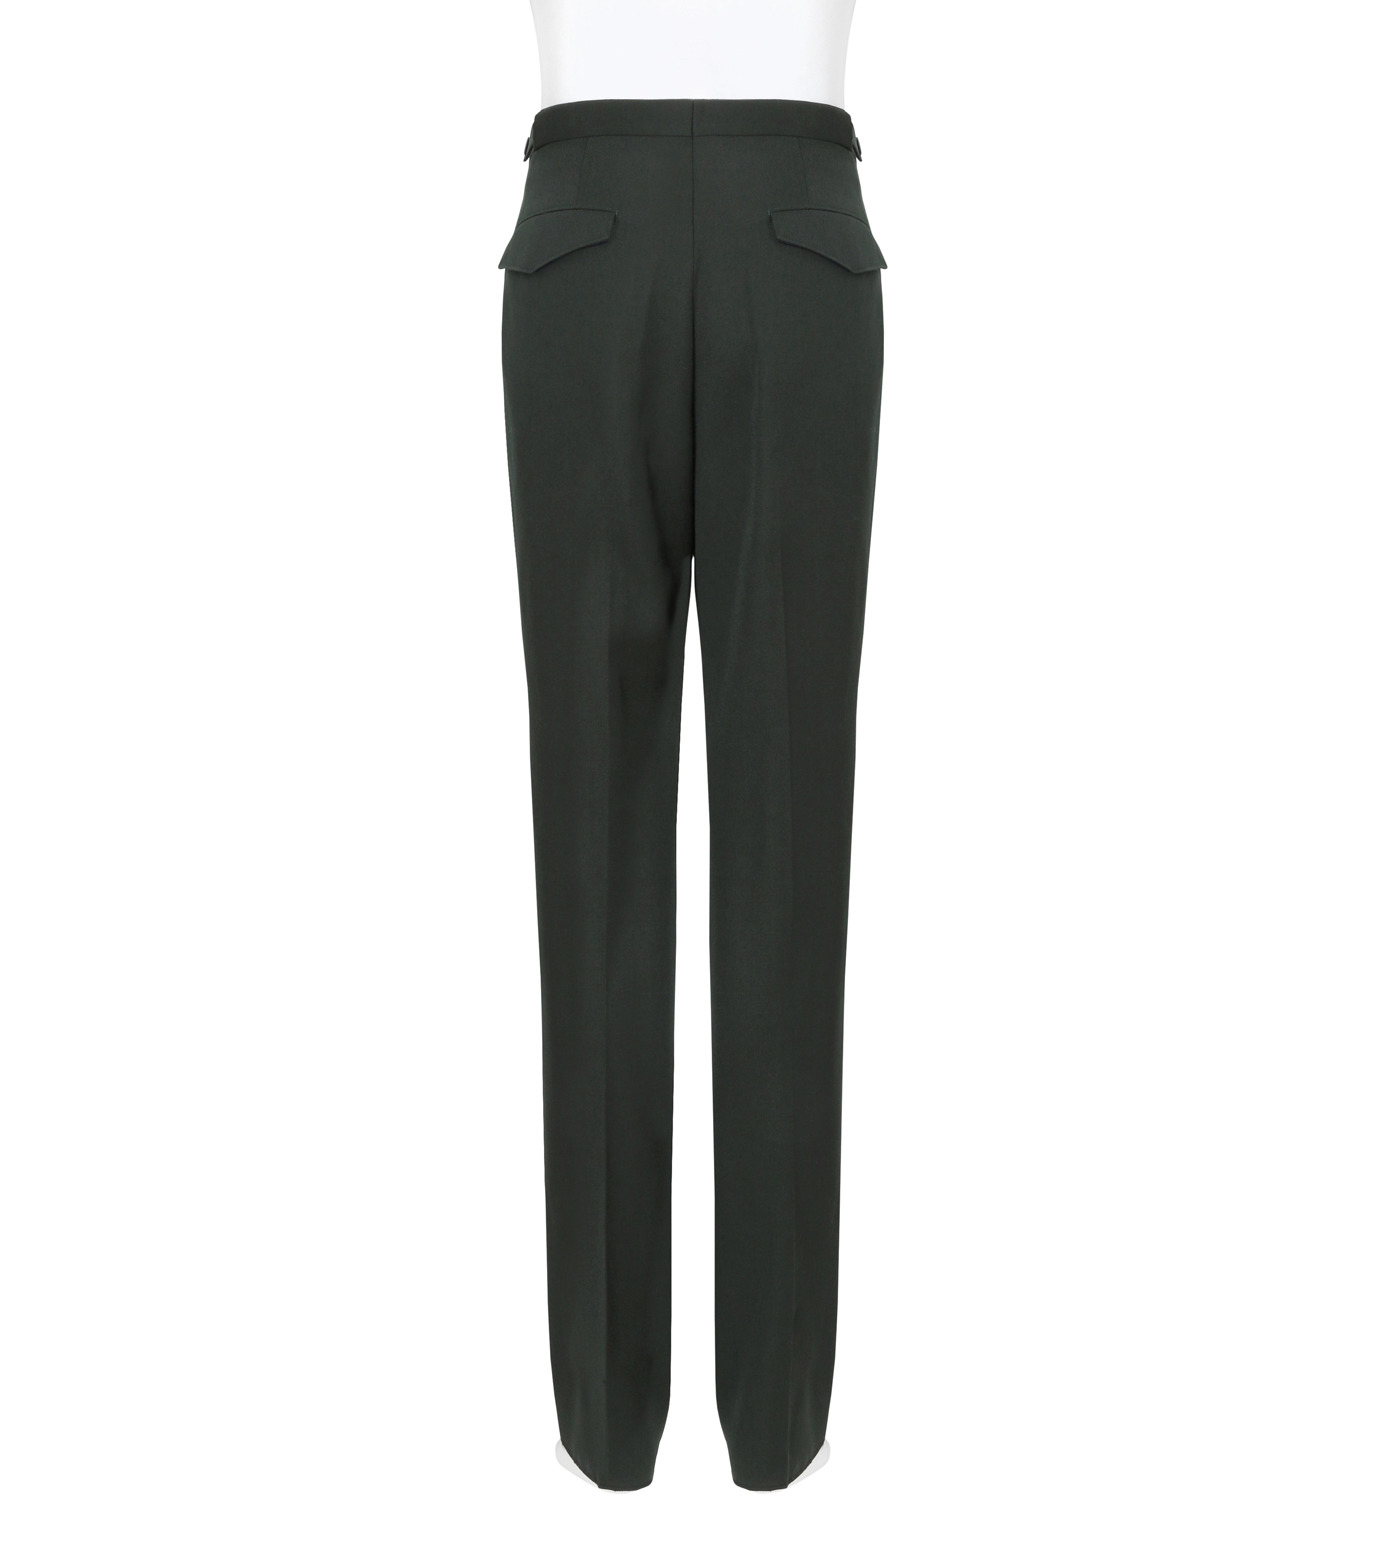 RAF SIMONS(ラフシモンズ)のSlim Trousers-GREEN(パンツ/pants)-341-20017-22 拡大詳細画像2